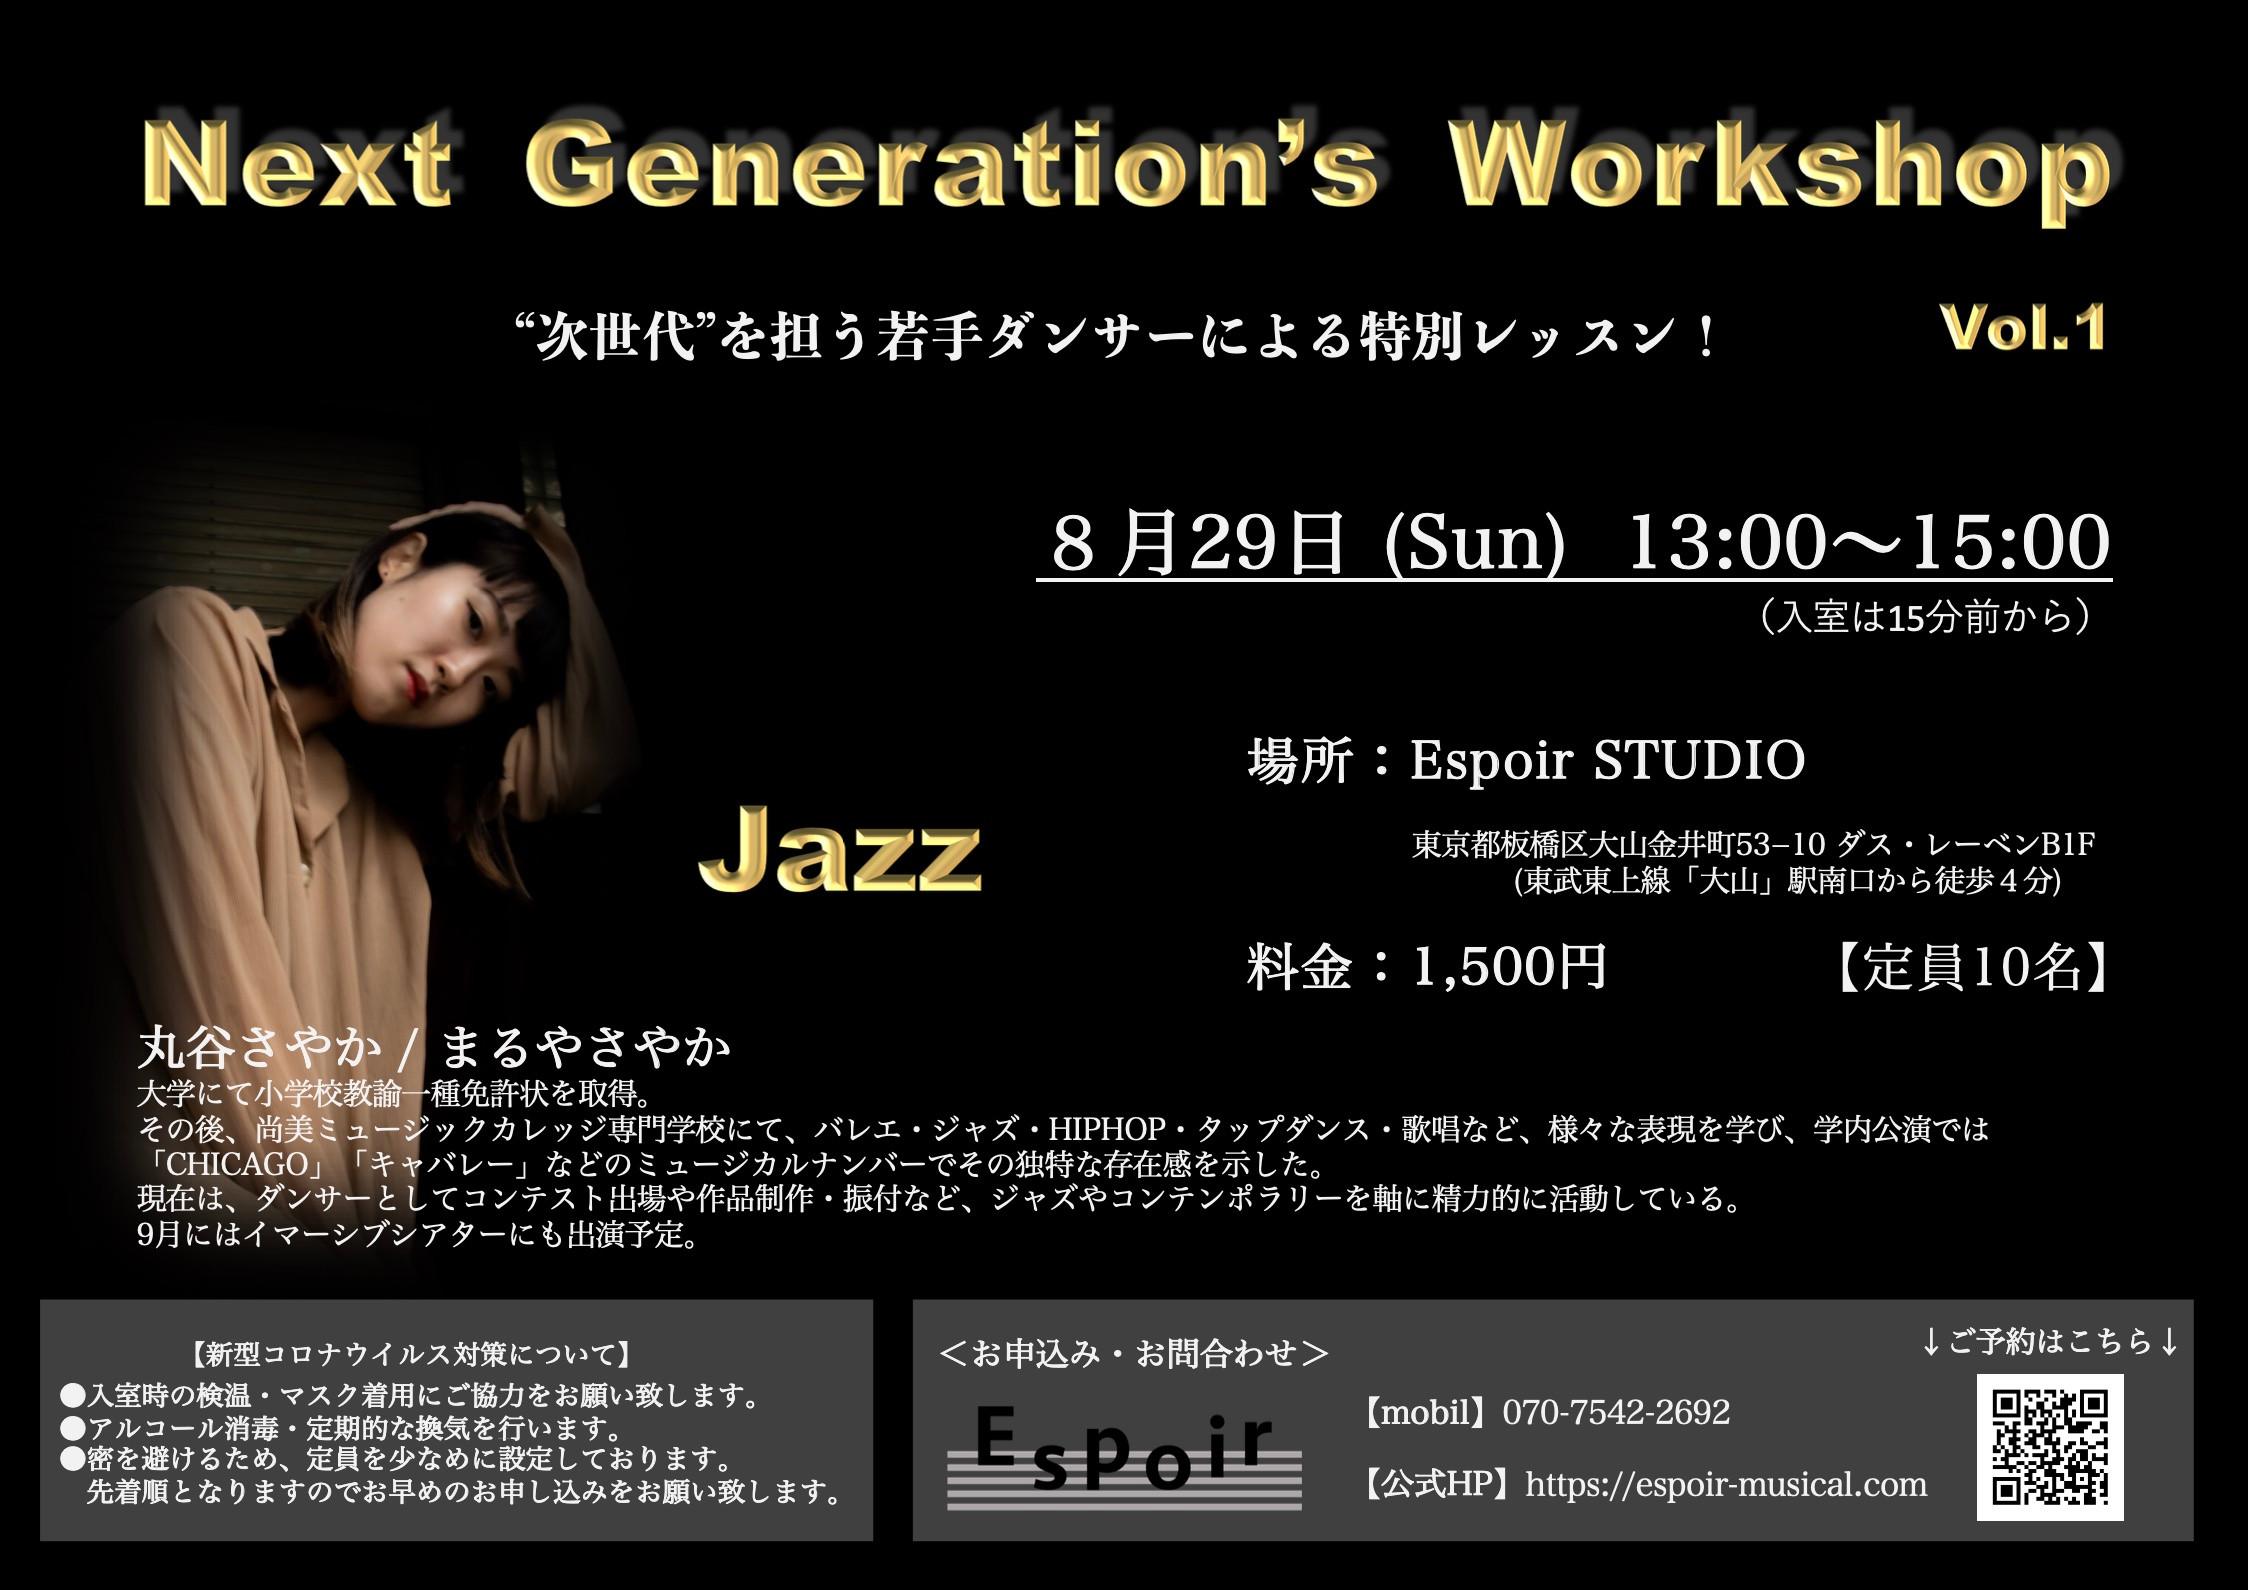 Next Generation's Workshop Vol.1